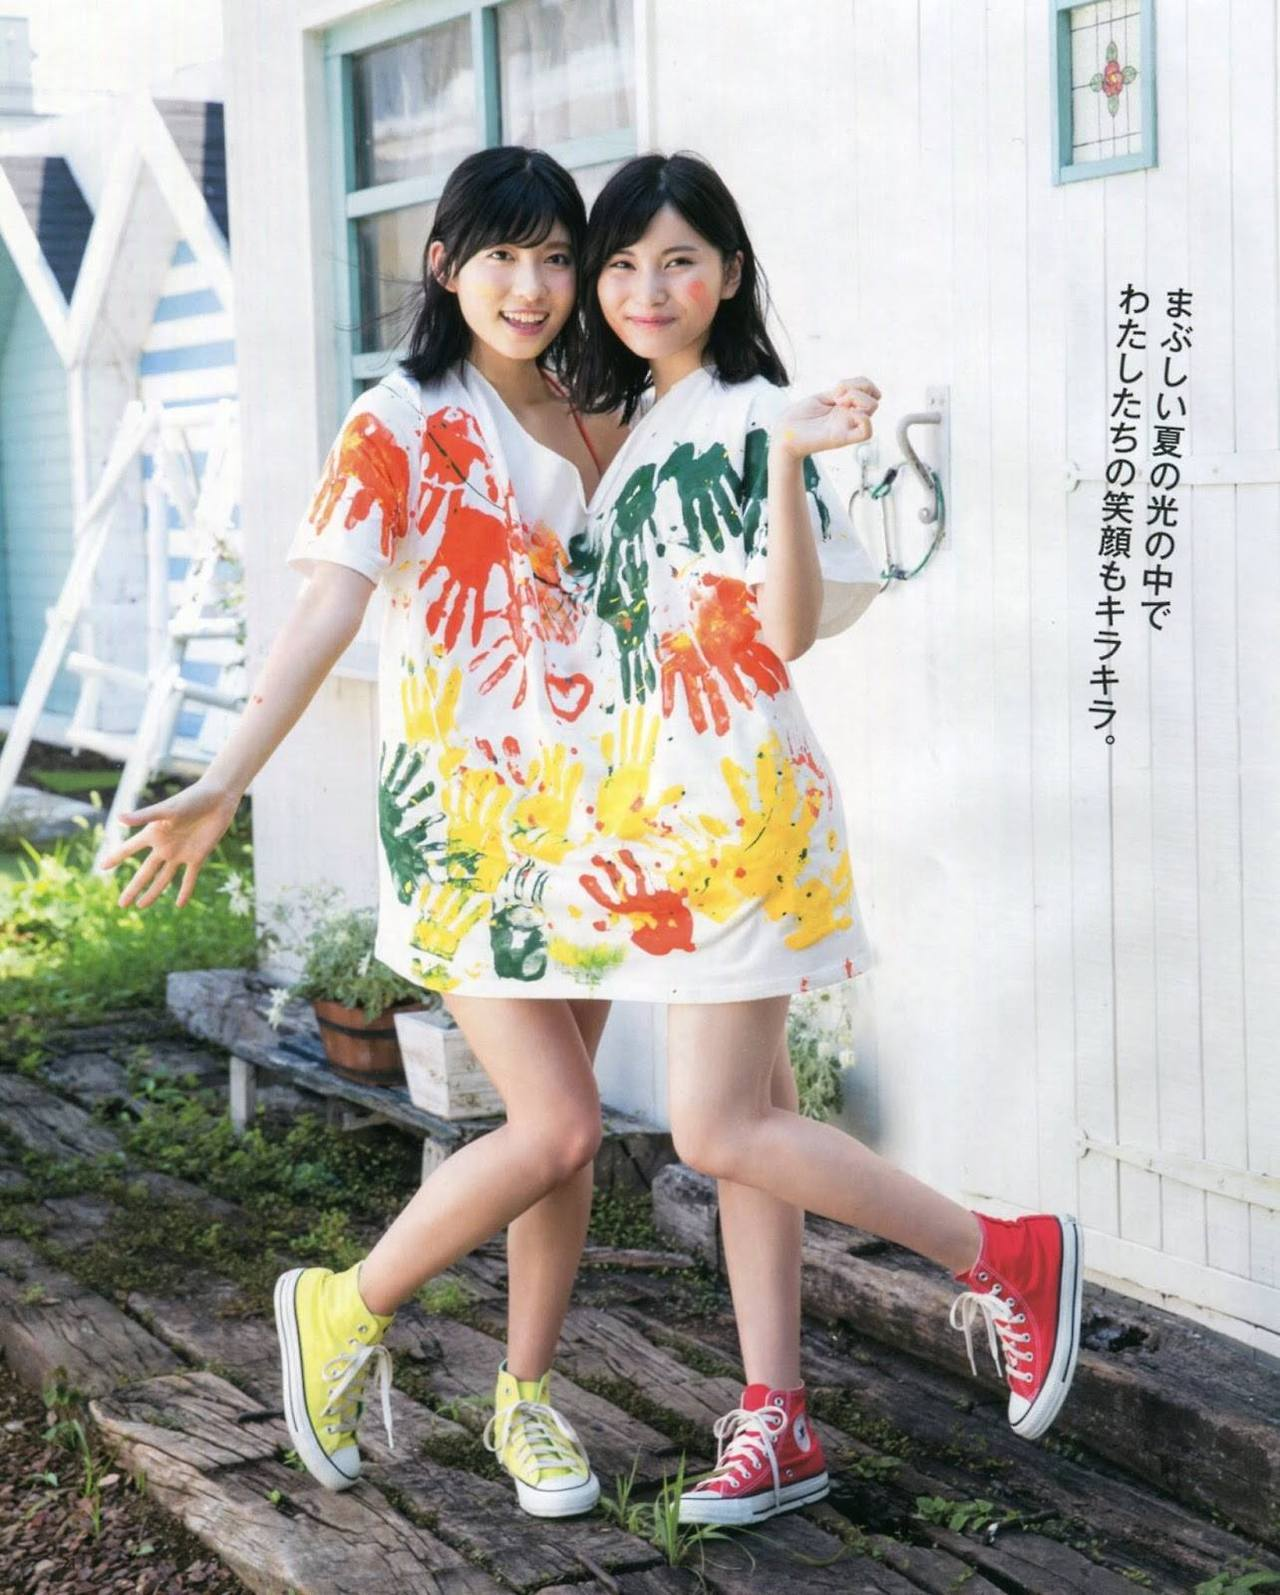 Fukuoka Seina 福岡聖菜, Taniguchi Megu 谷口めぐ, BOMB! 2017.10 (ボム 2017年10月号)